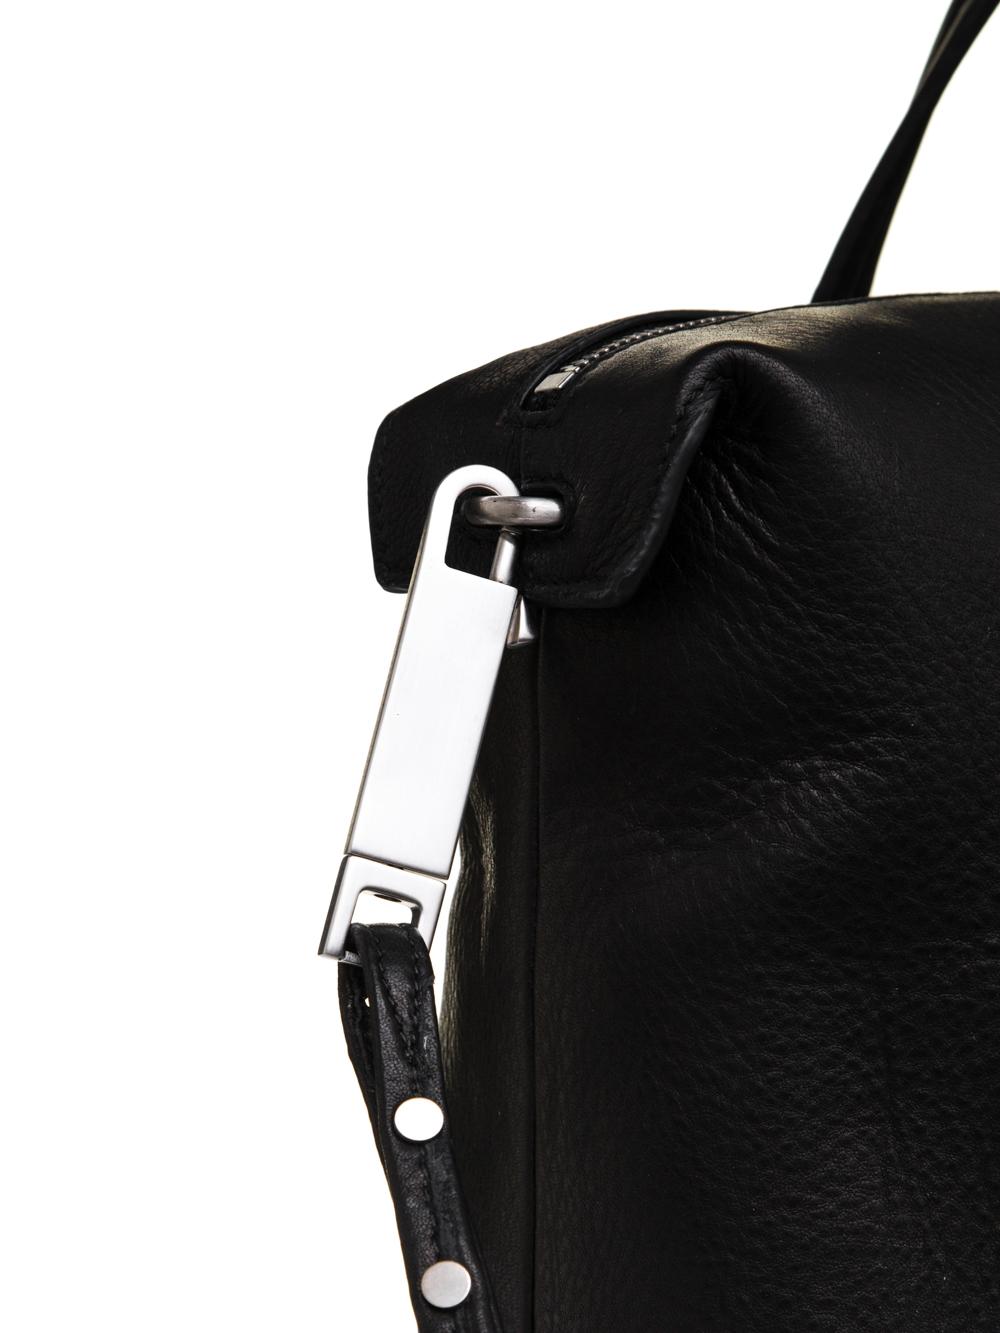 RICK OWENS FW18 SISYPHUS DAYBAG IN BLACK LAMB LEATHER